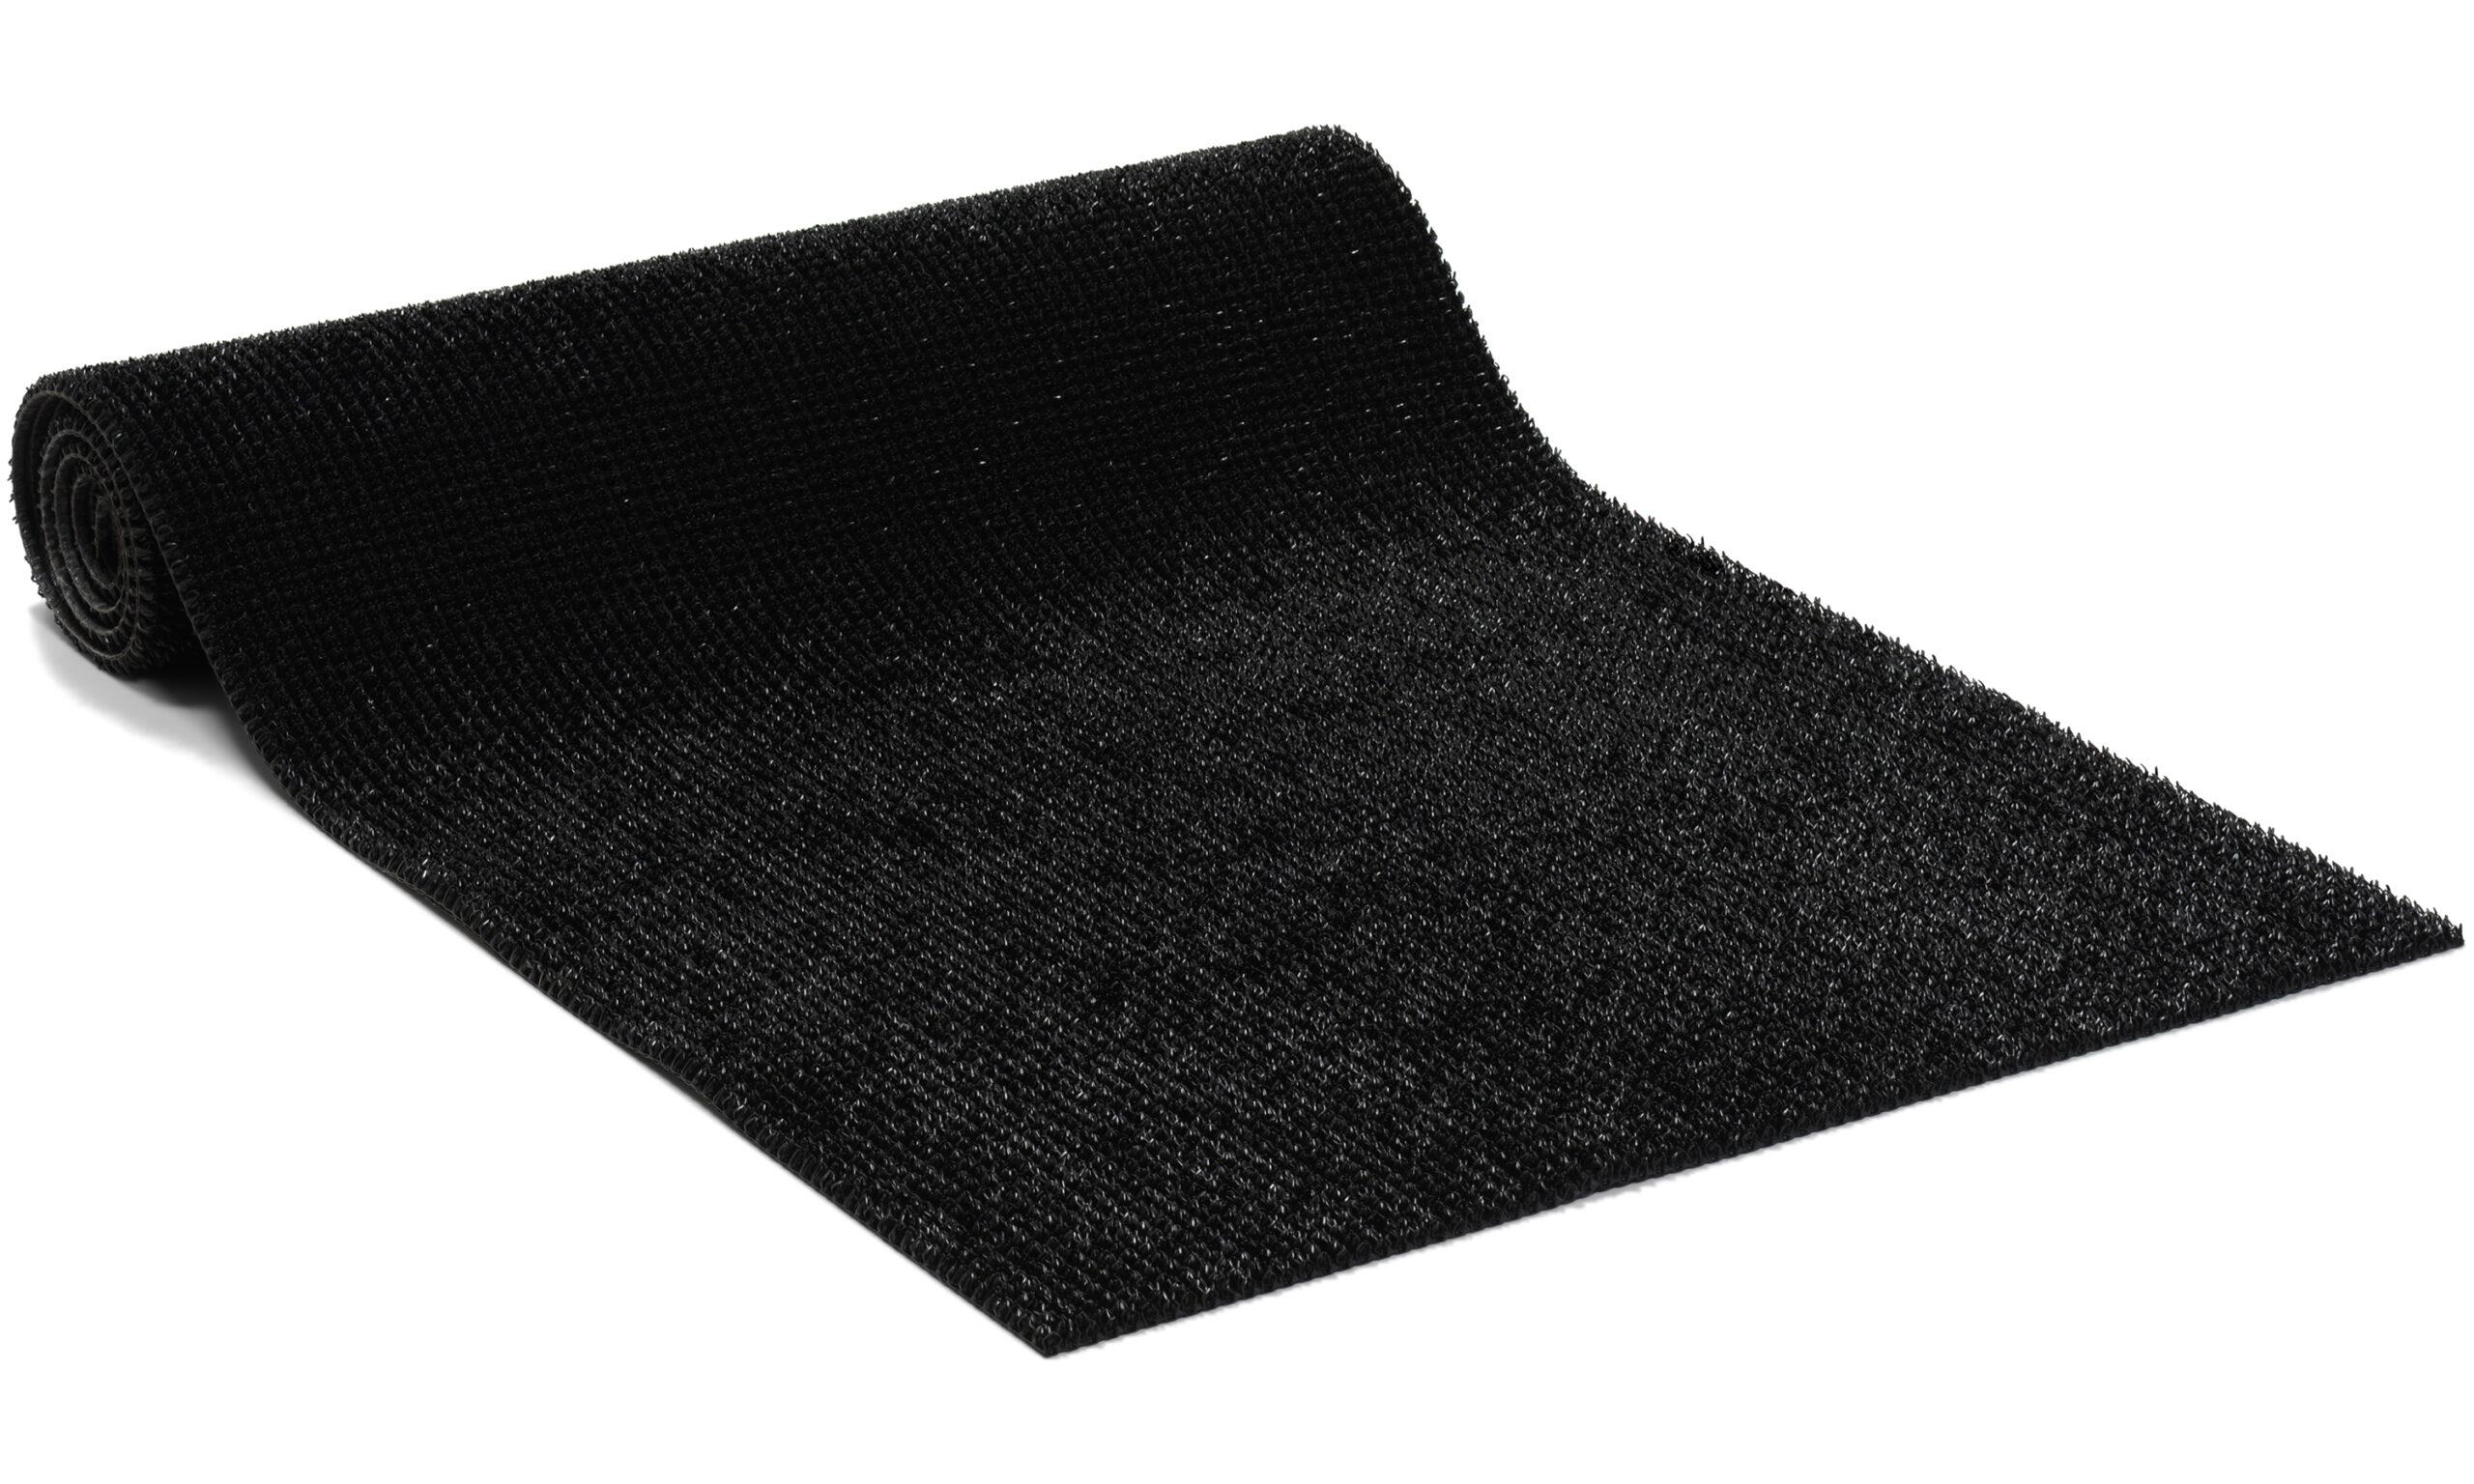 Bristlex svart - Entrématte på metervare